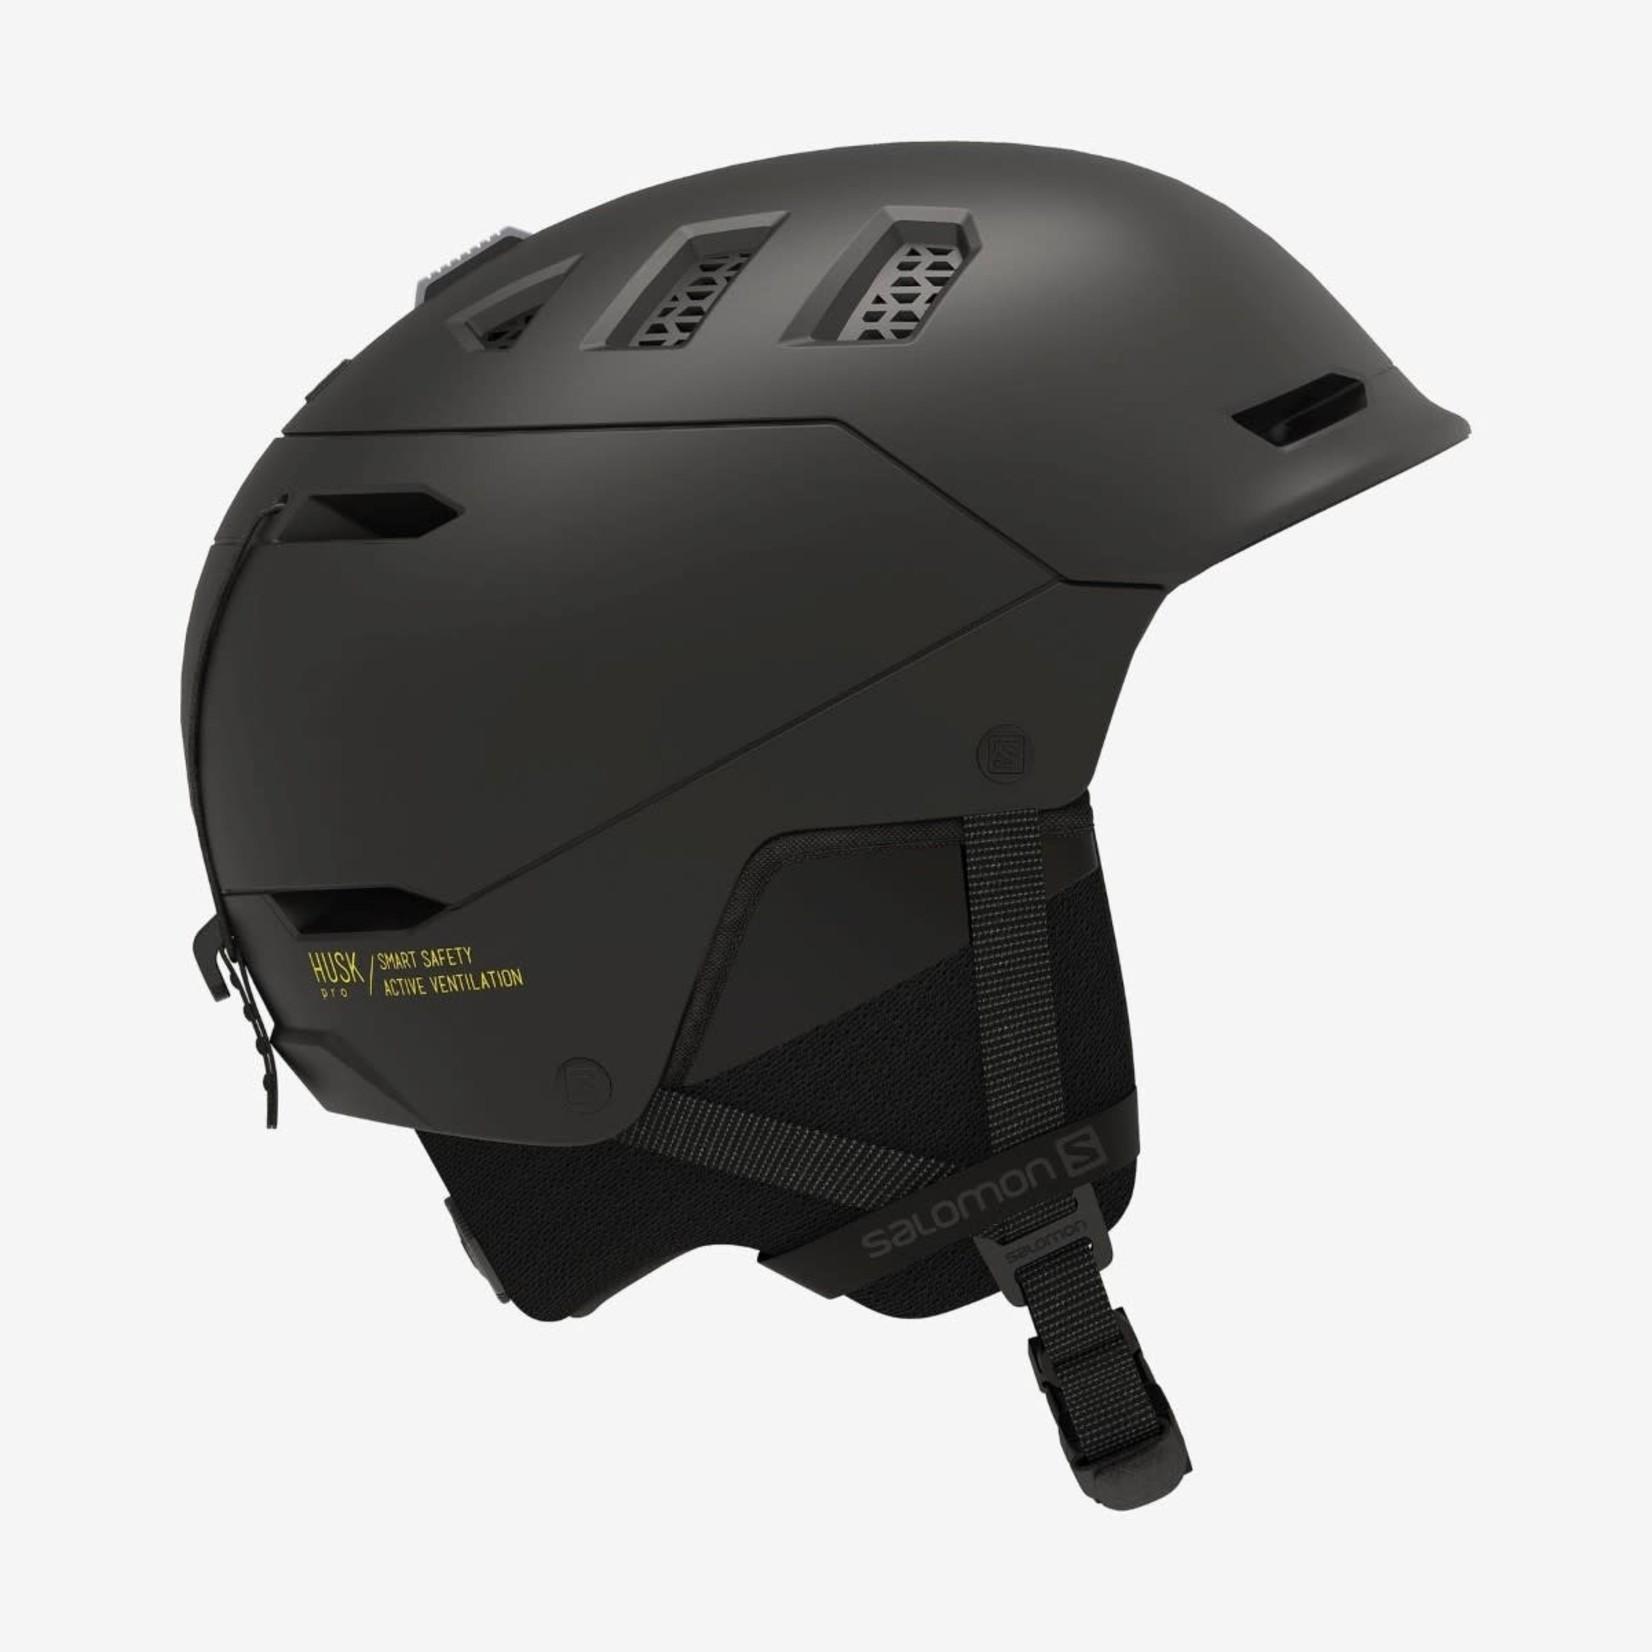 Salomon Salomon Husk Pro Ski Helmet - Unisex